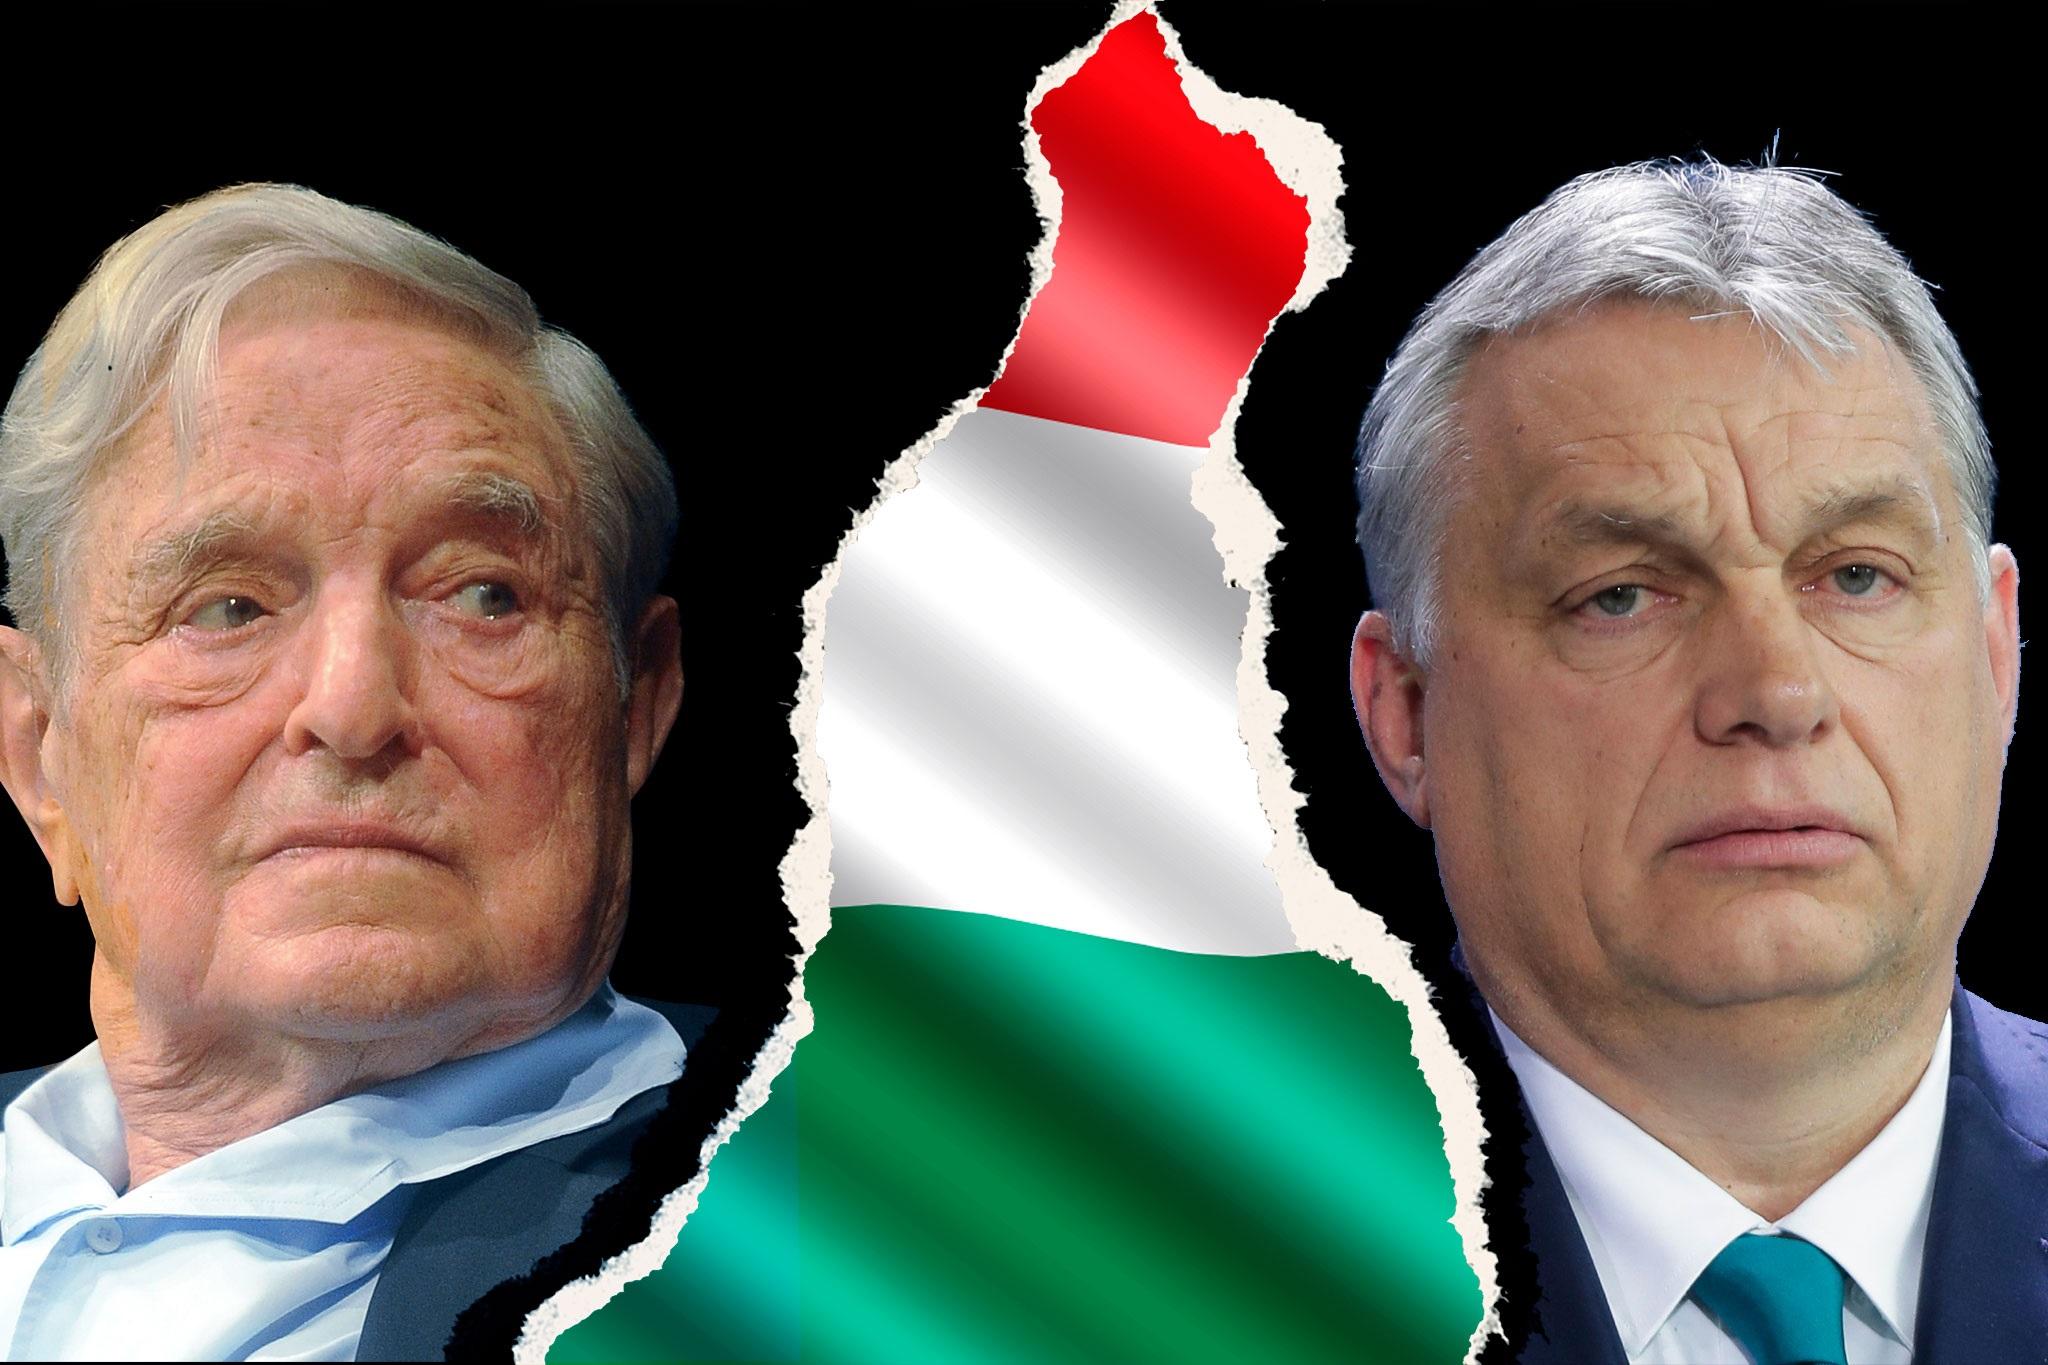 George Soros (l.) und Ungarns Ministerpräsident Viktor Orban Foto: Picture-Alliance / AP Photo / Markus Schreiber/Wikimedia Commons / Niccolò Caranti /JF-Montage